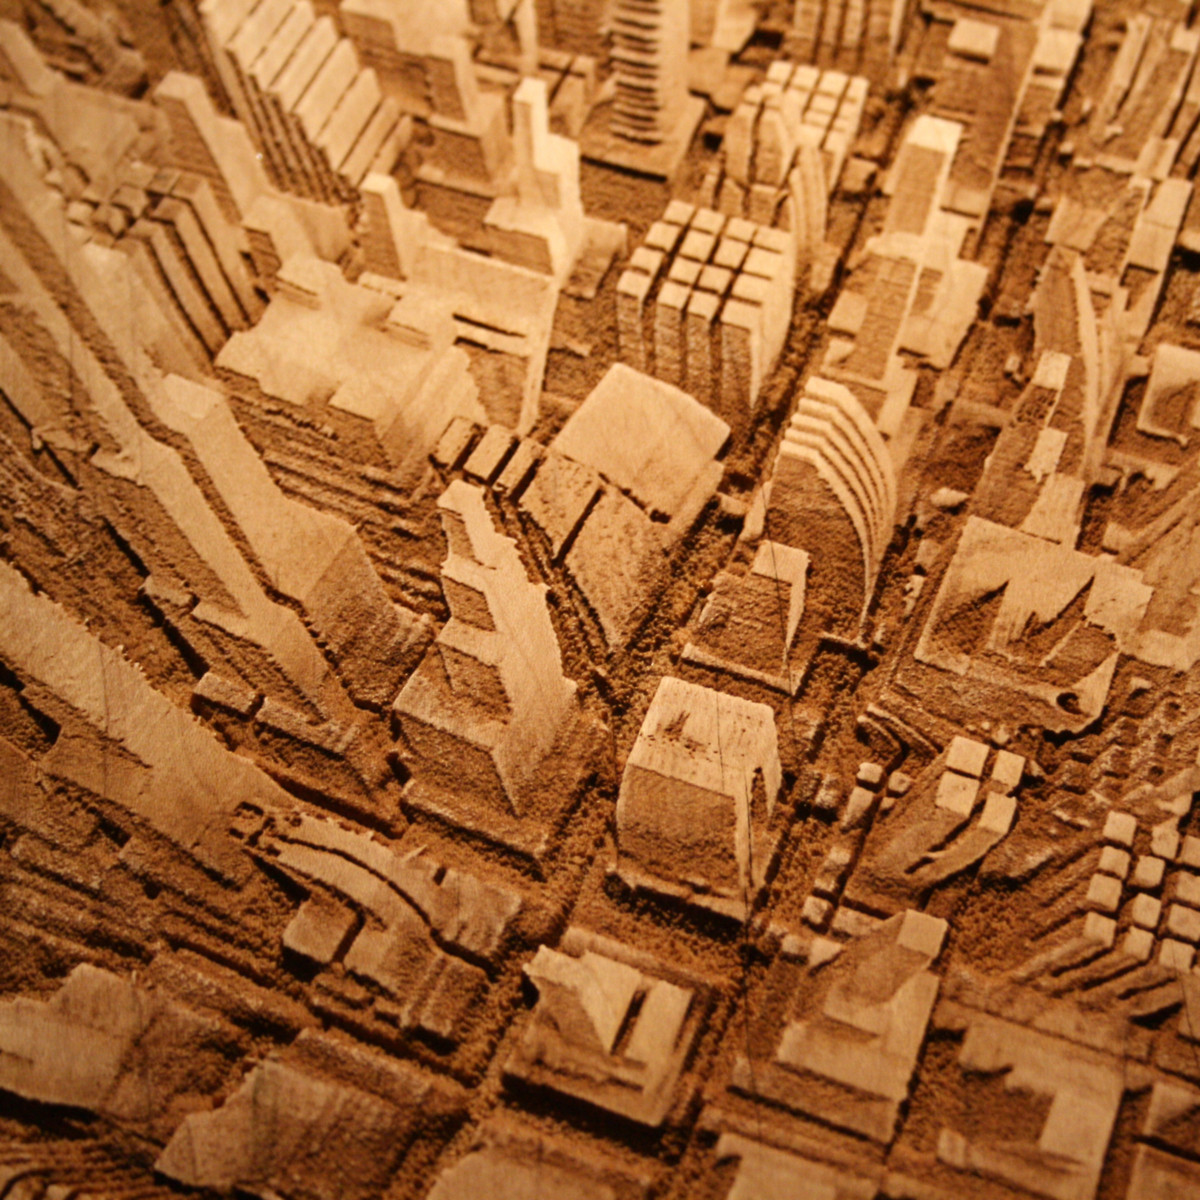 Galer a de arte y arquitectura paisajes urbanos en madera for Paisajes para murales de pared